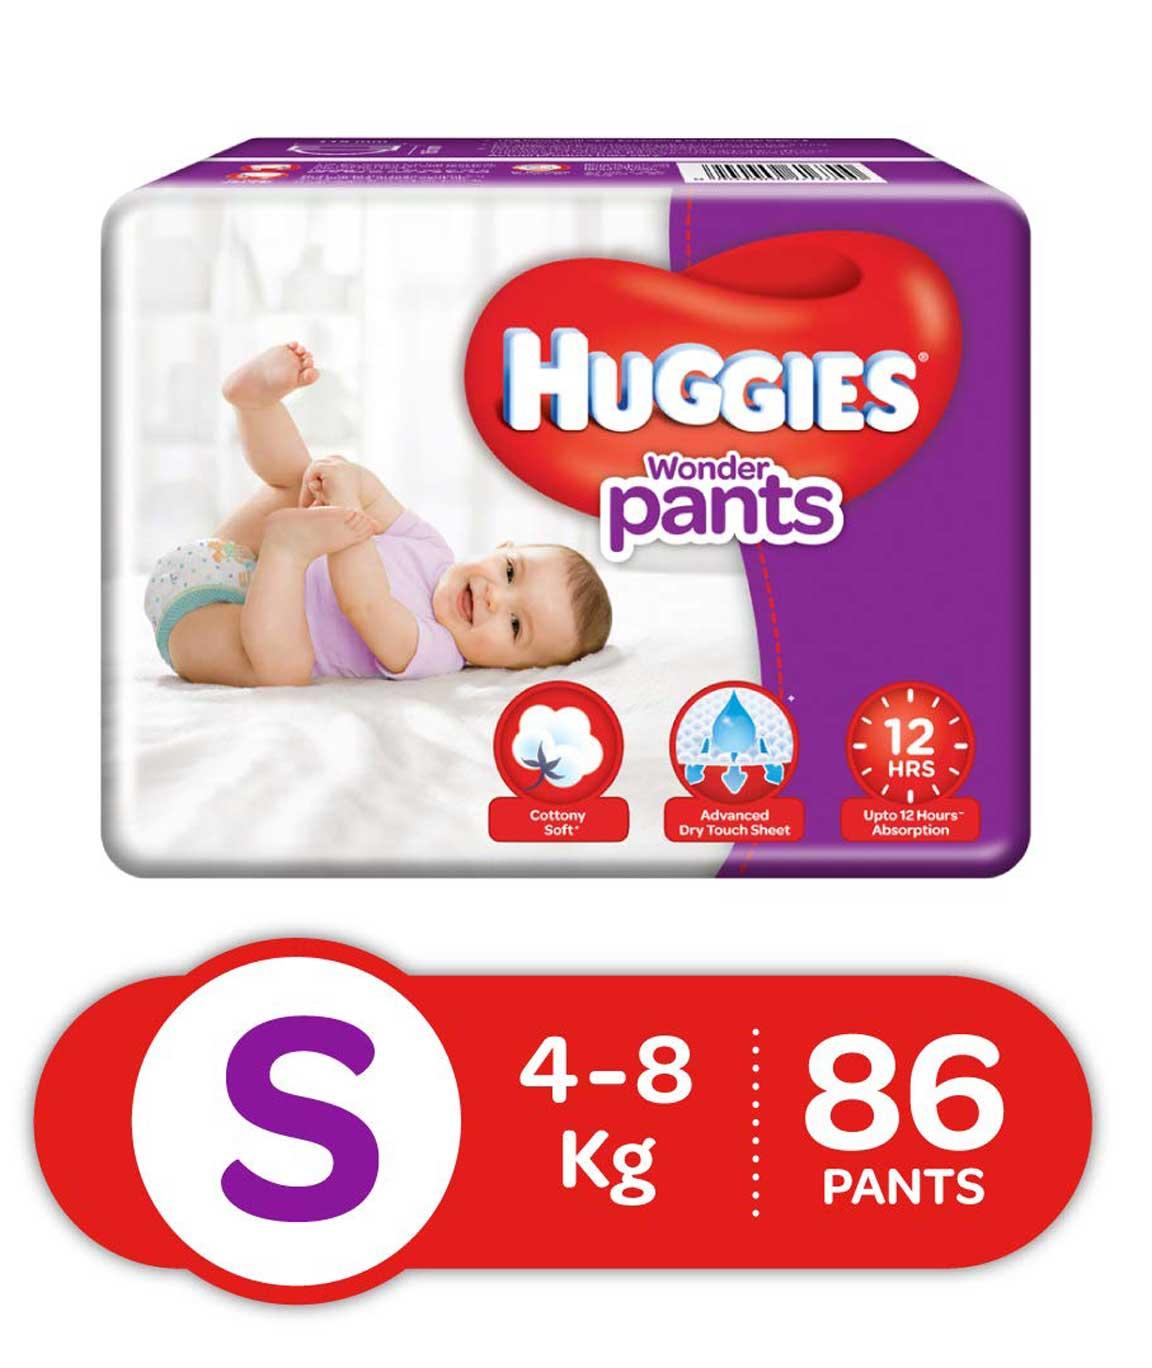 Huggies Wonder Pants Diapers Small Pack of 86